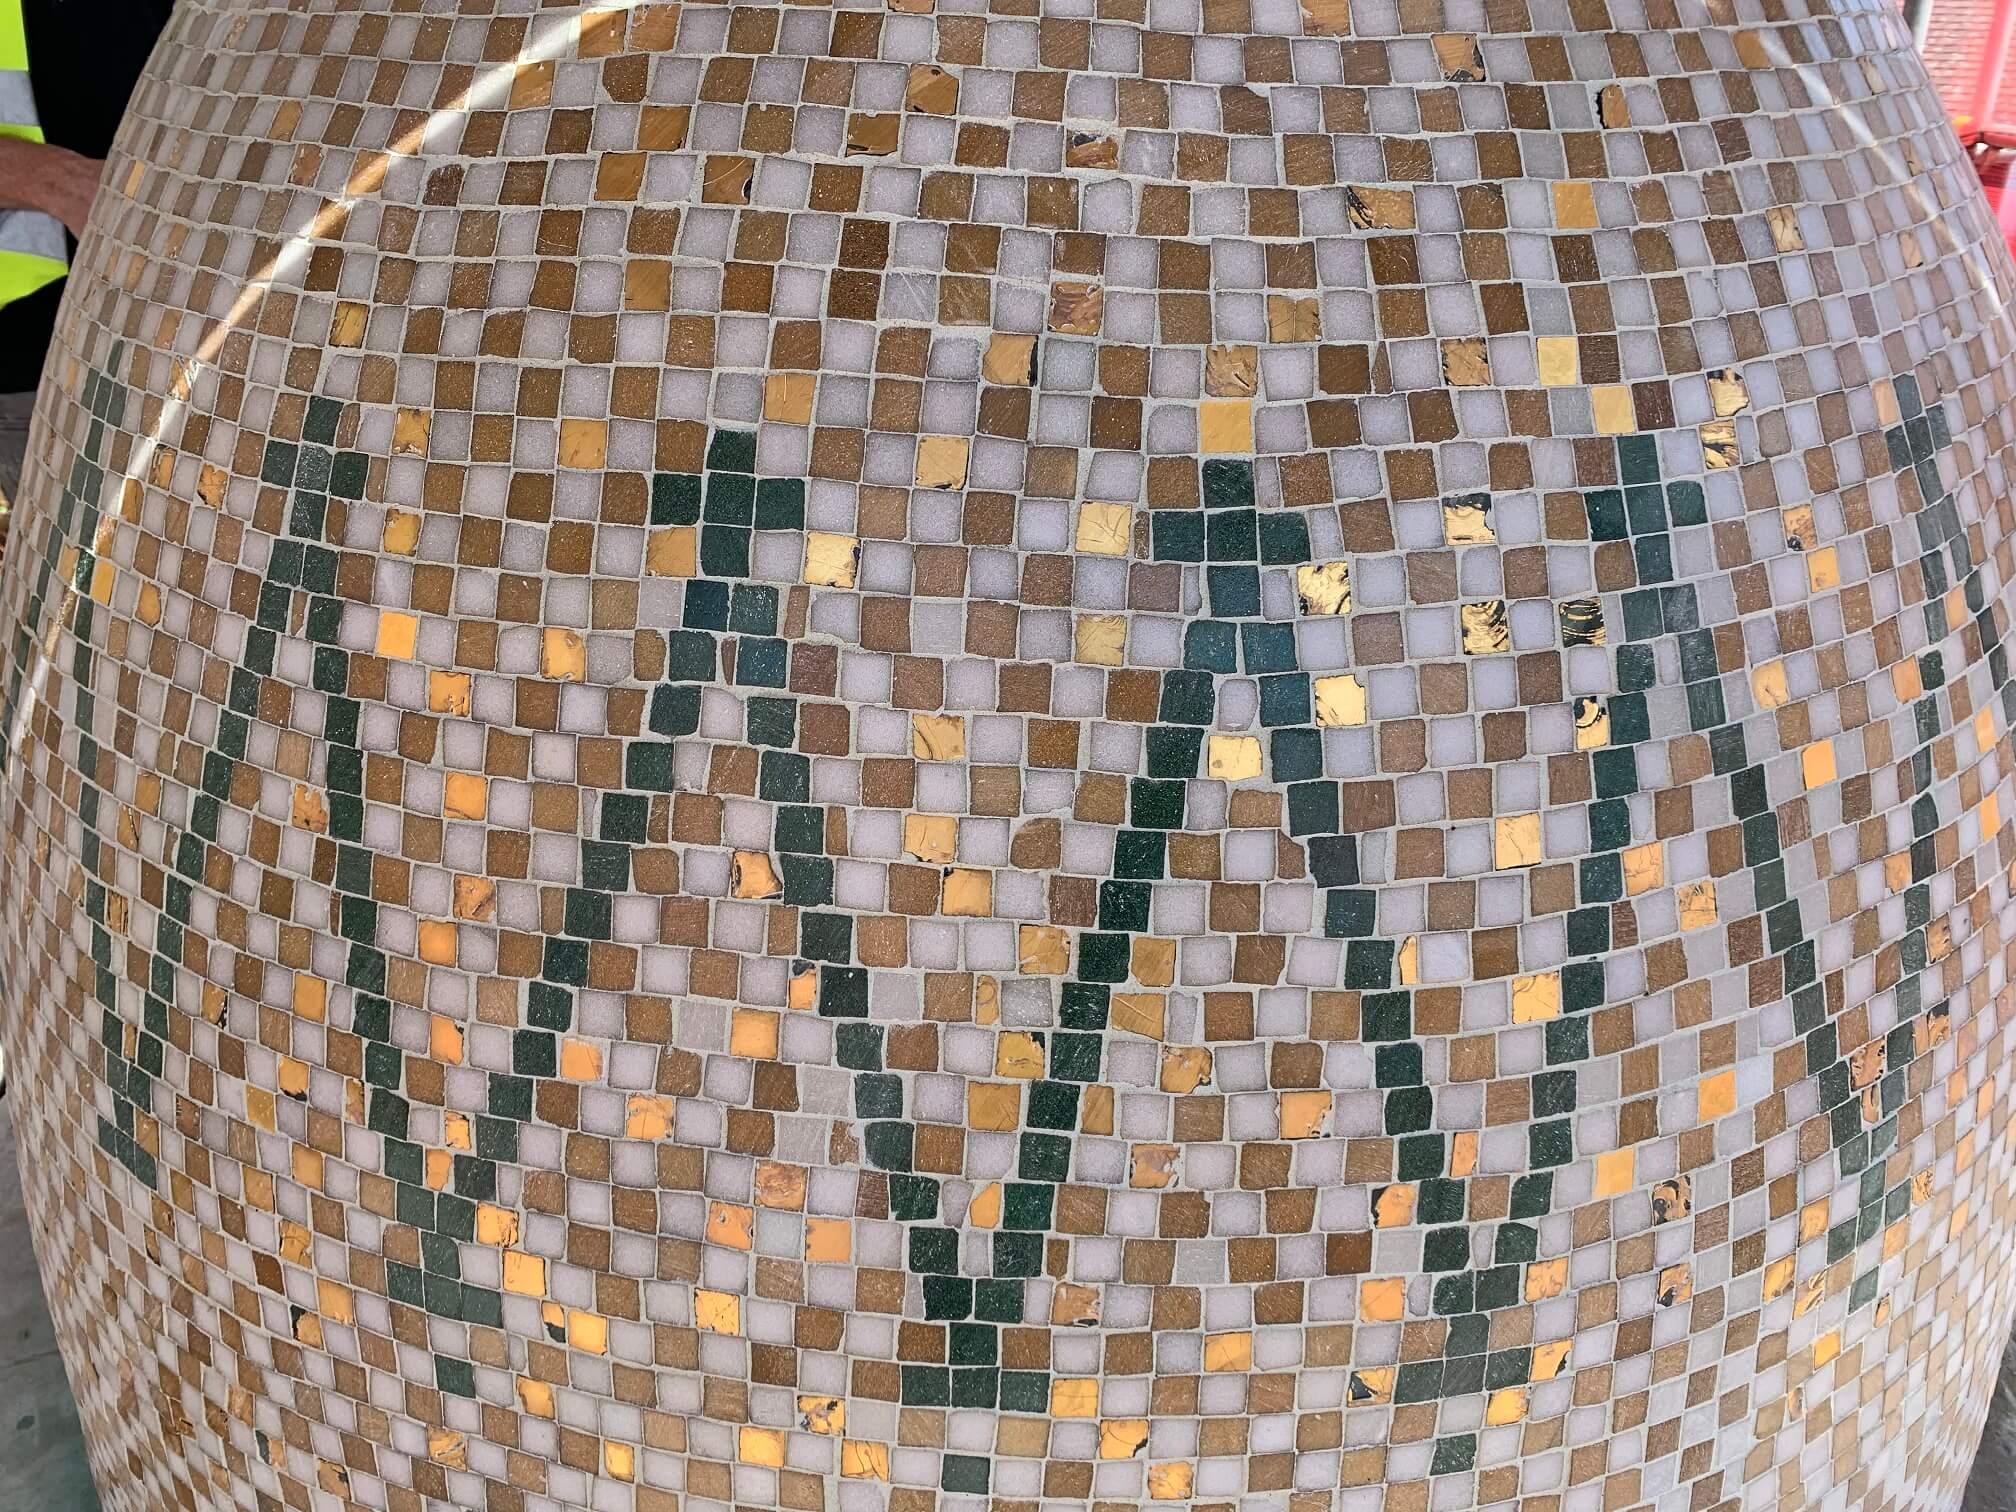 Mayflower Memorial Mosaic Southampton